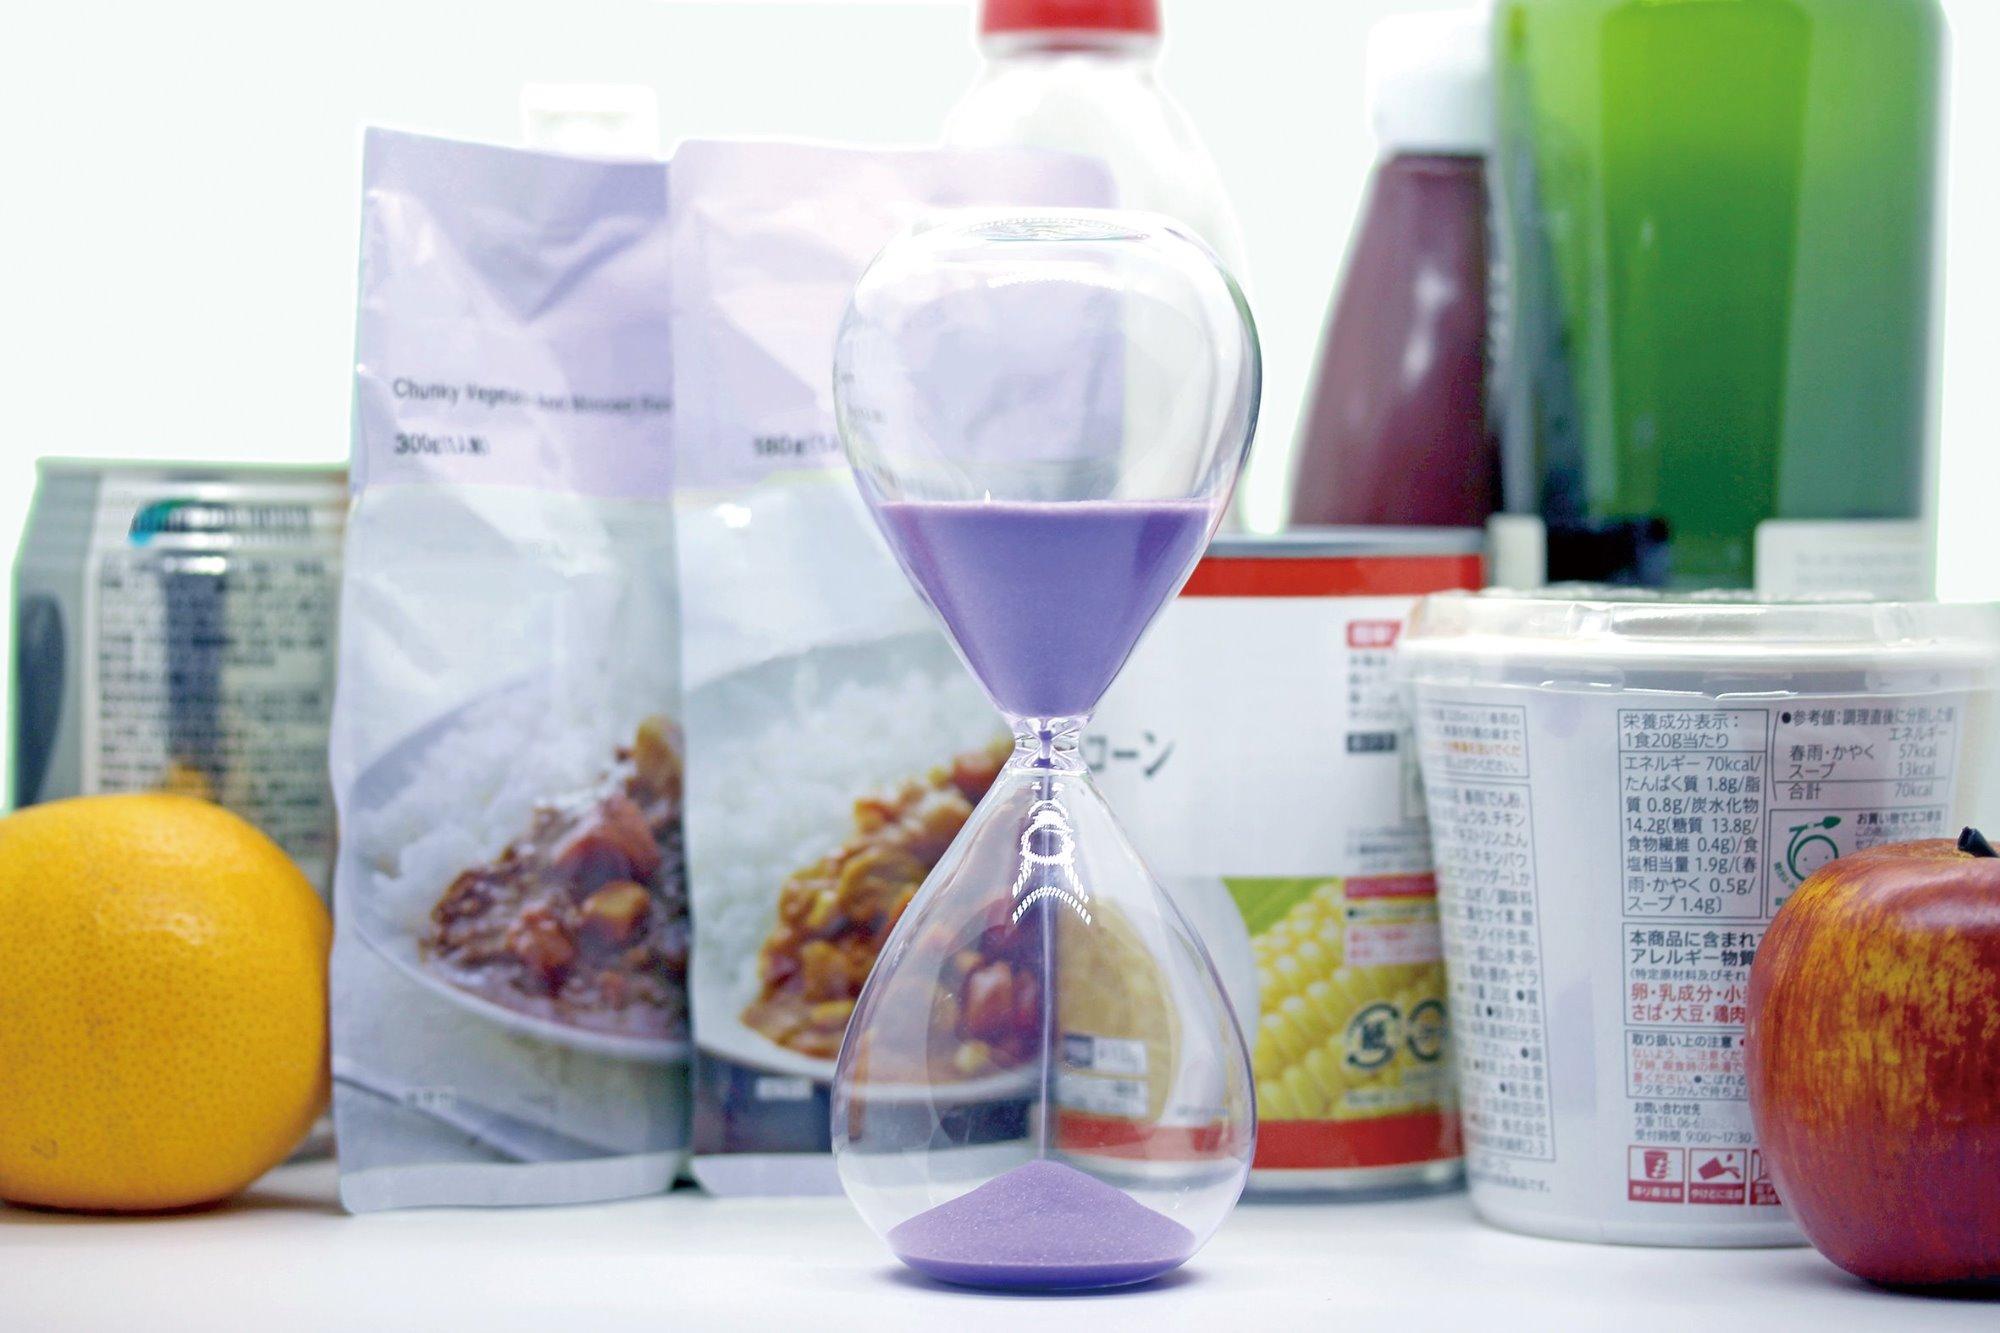 【HDC大阪 くらし向上計画】~家族の健康のために~ 添加物まるわかり講座